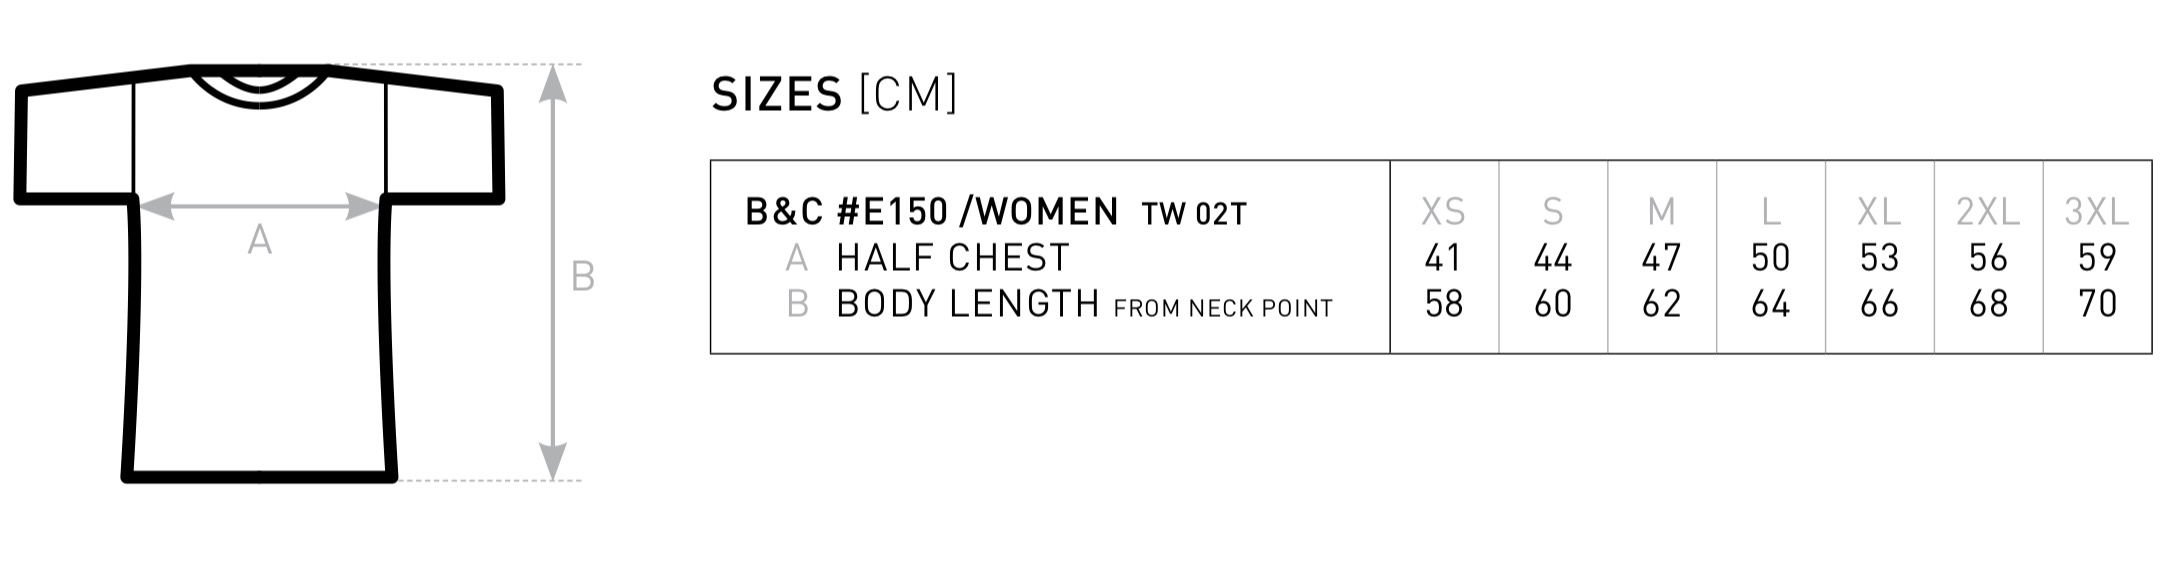 B&C: #E150 women T-Shirt TW02T | nawajo.de - Großhandelspreise für ...